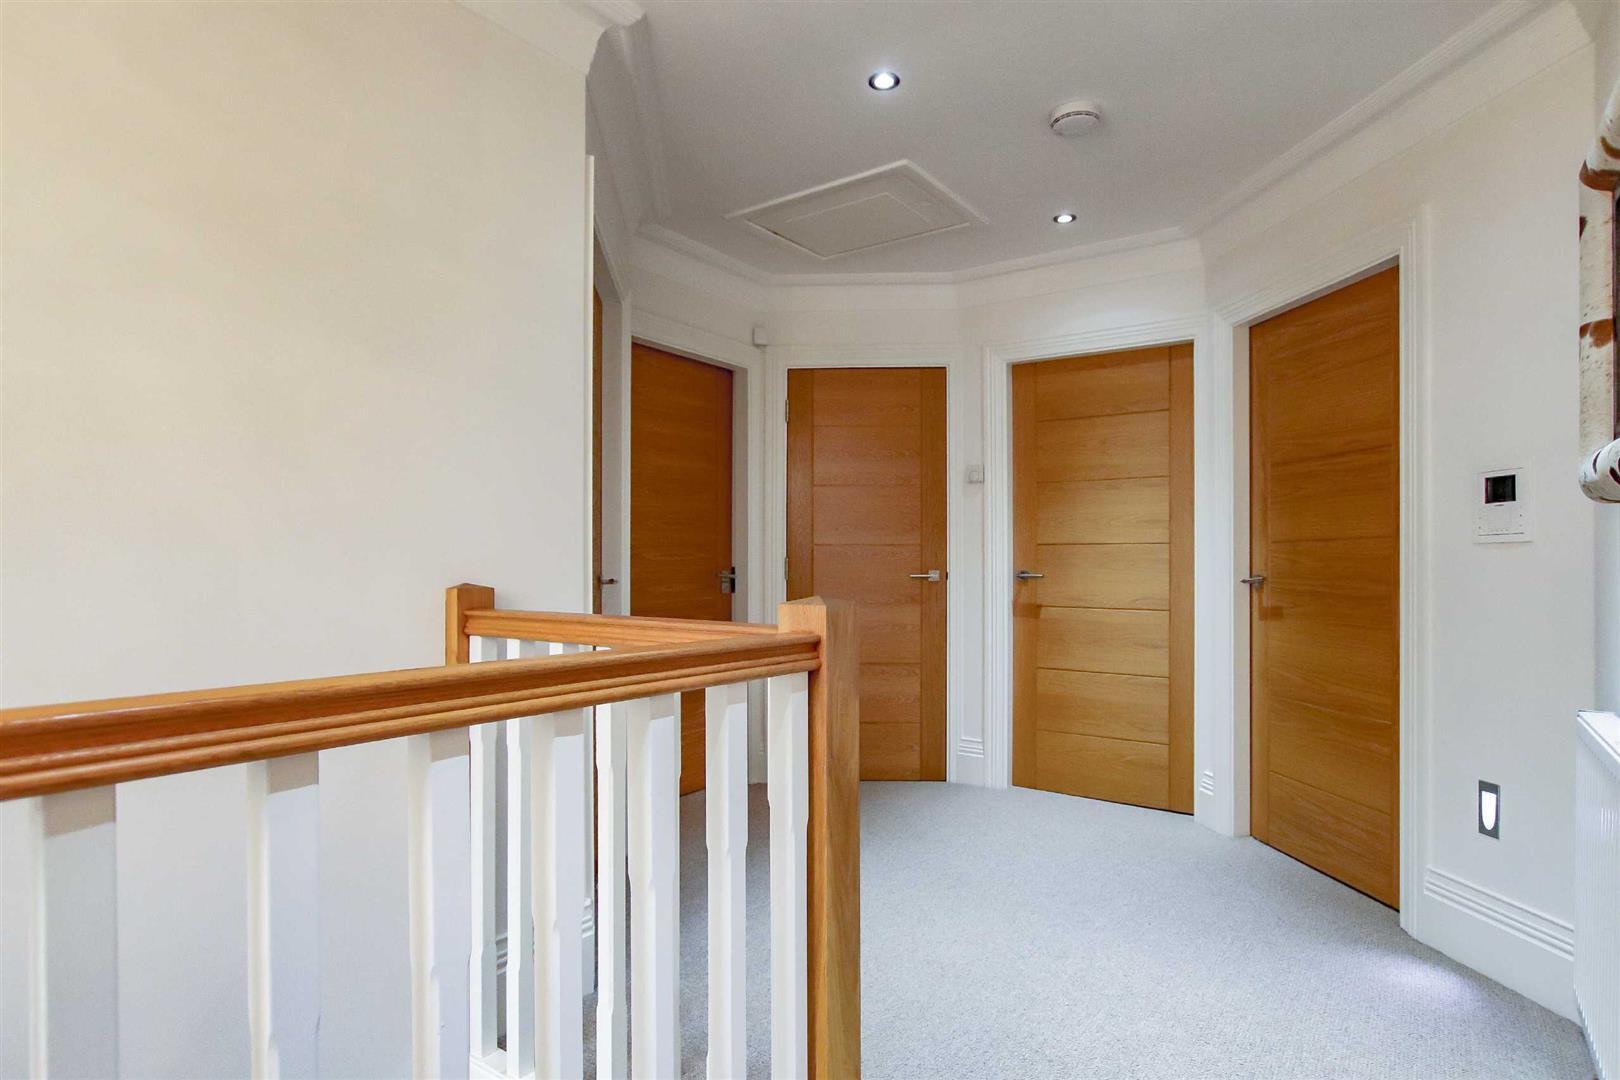 4 Bedroom Detached House For Sale - Image 19